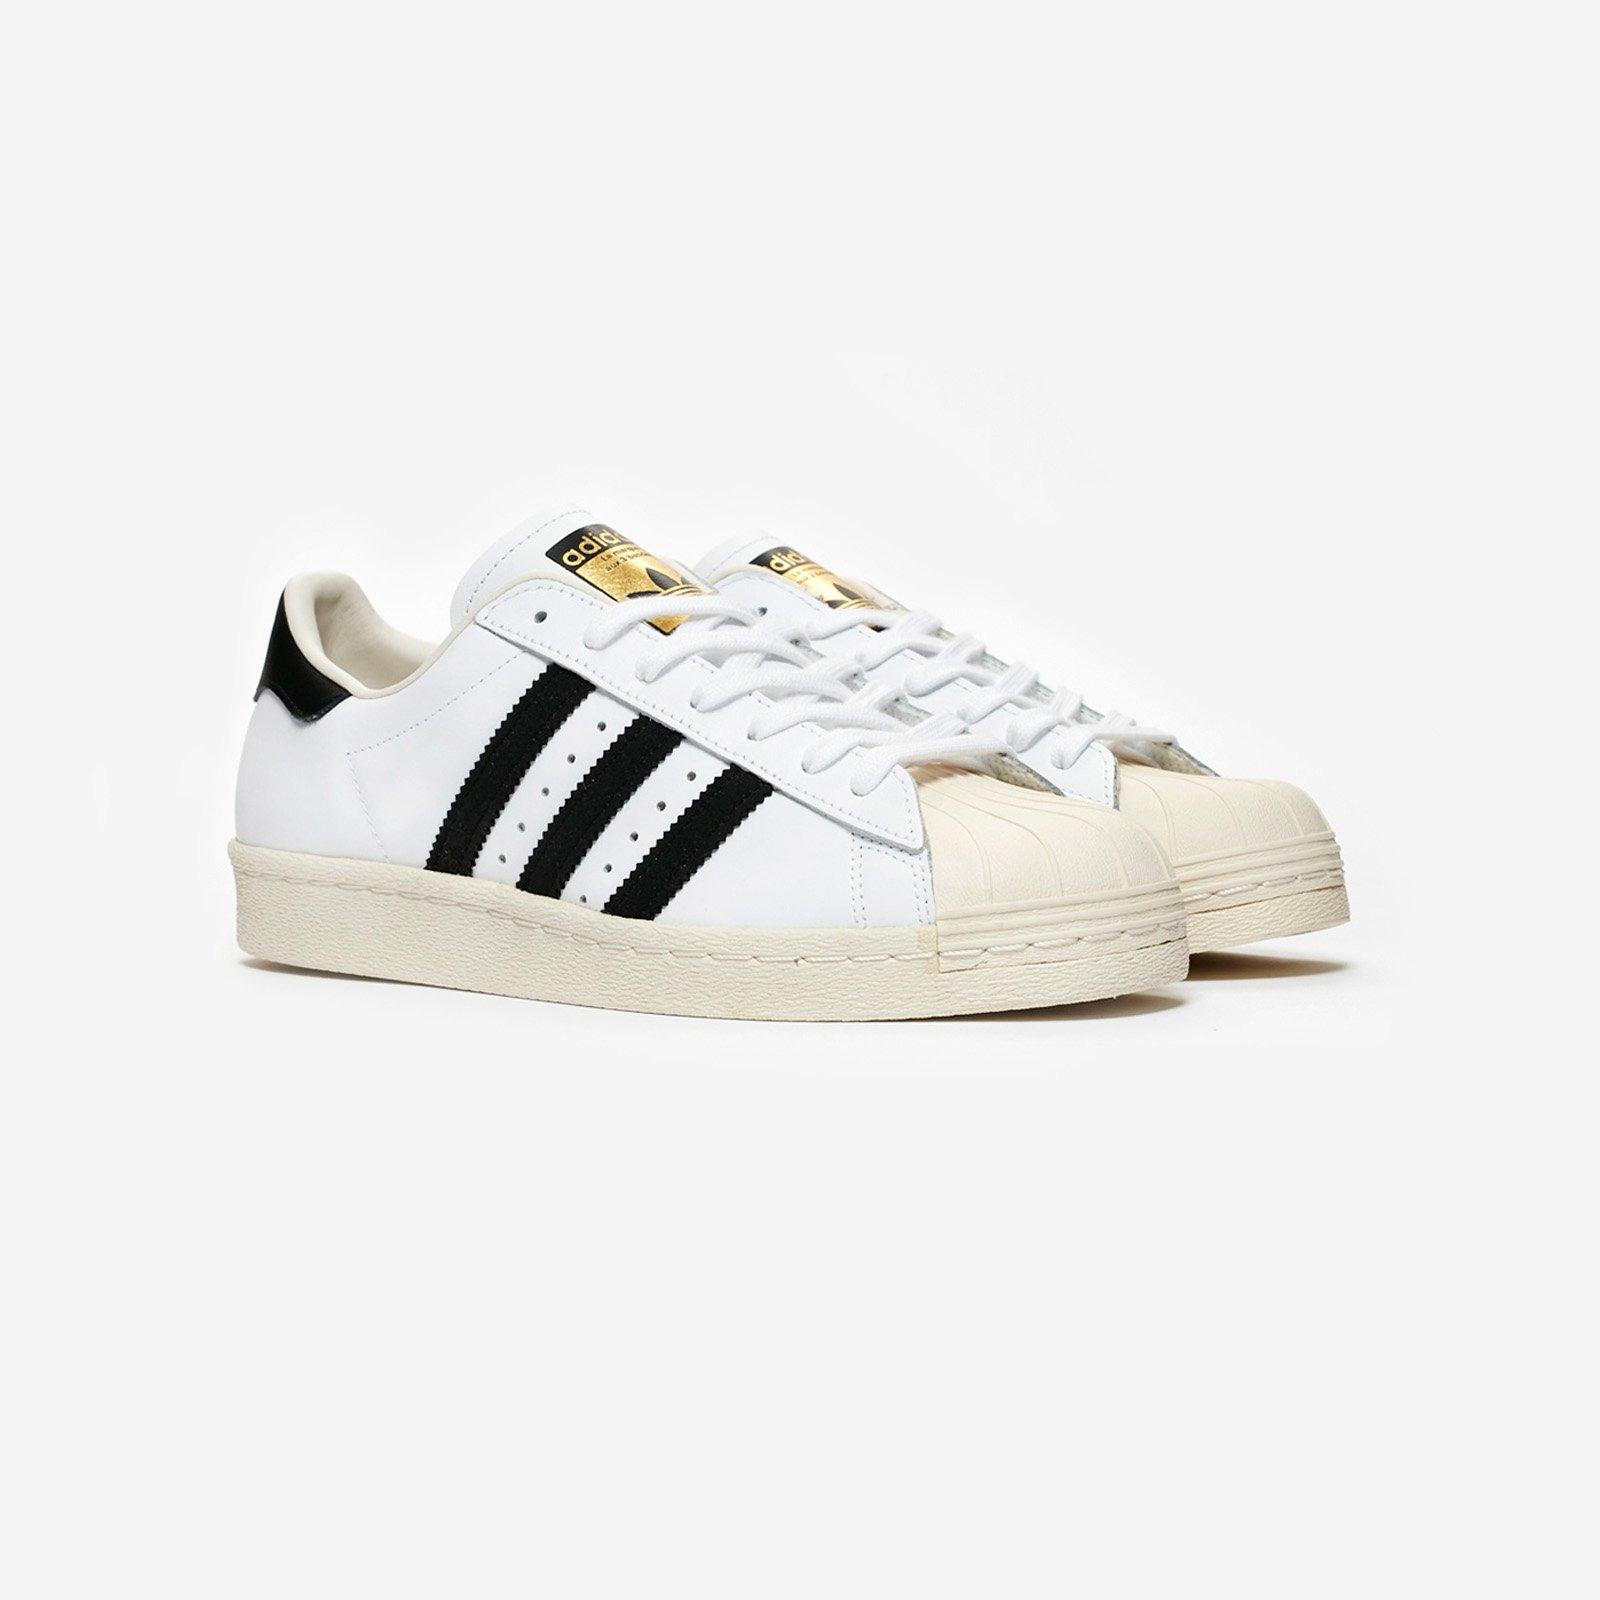 adidas Superstar 80s - G61070